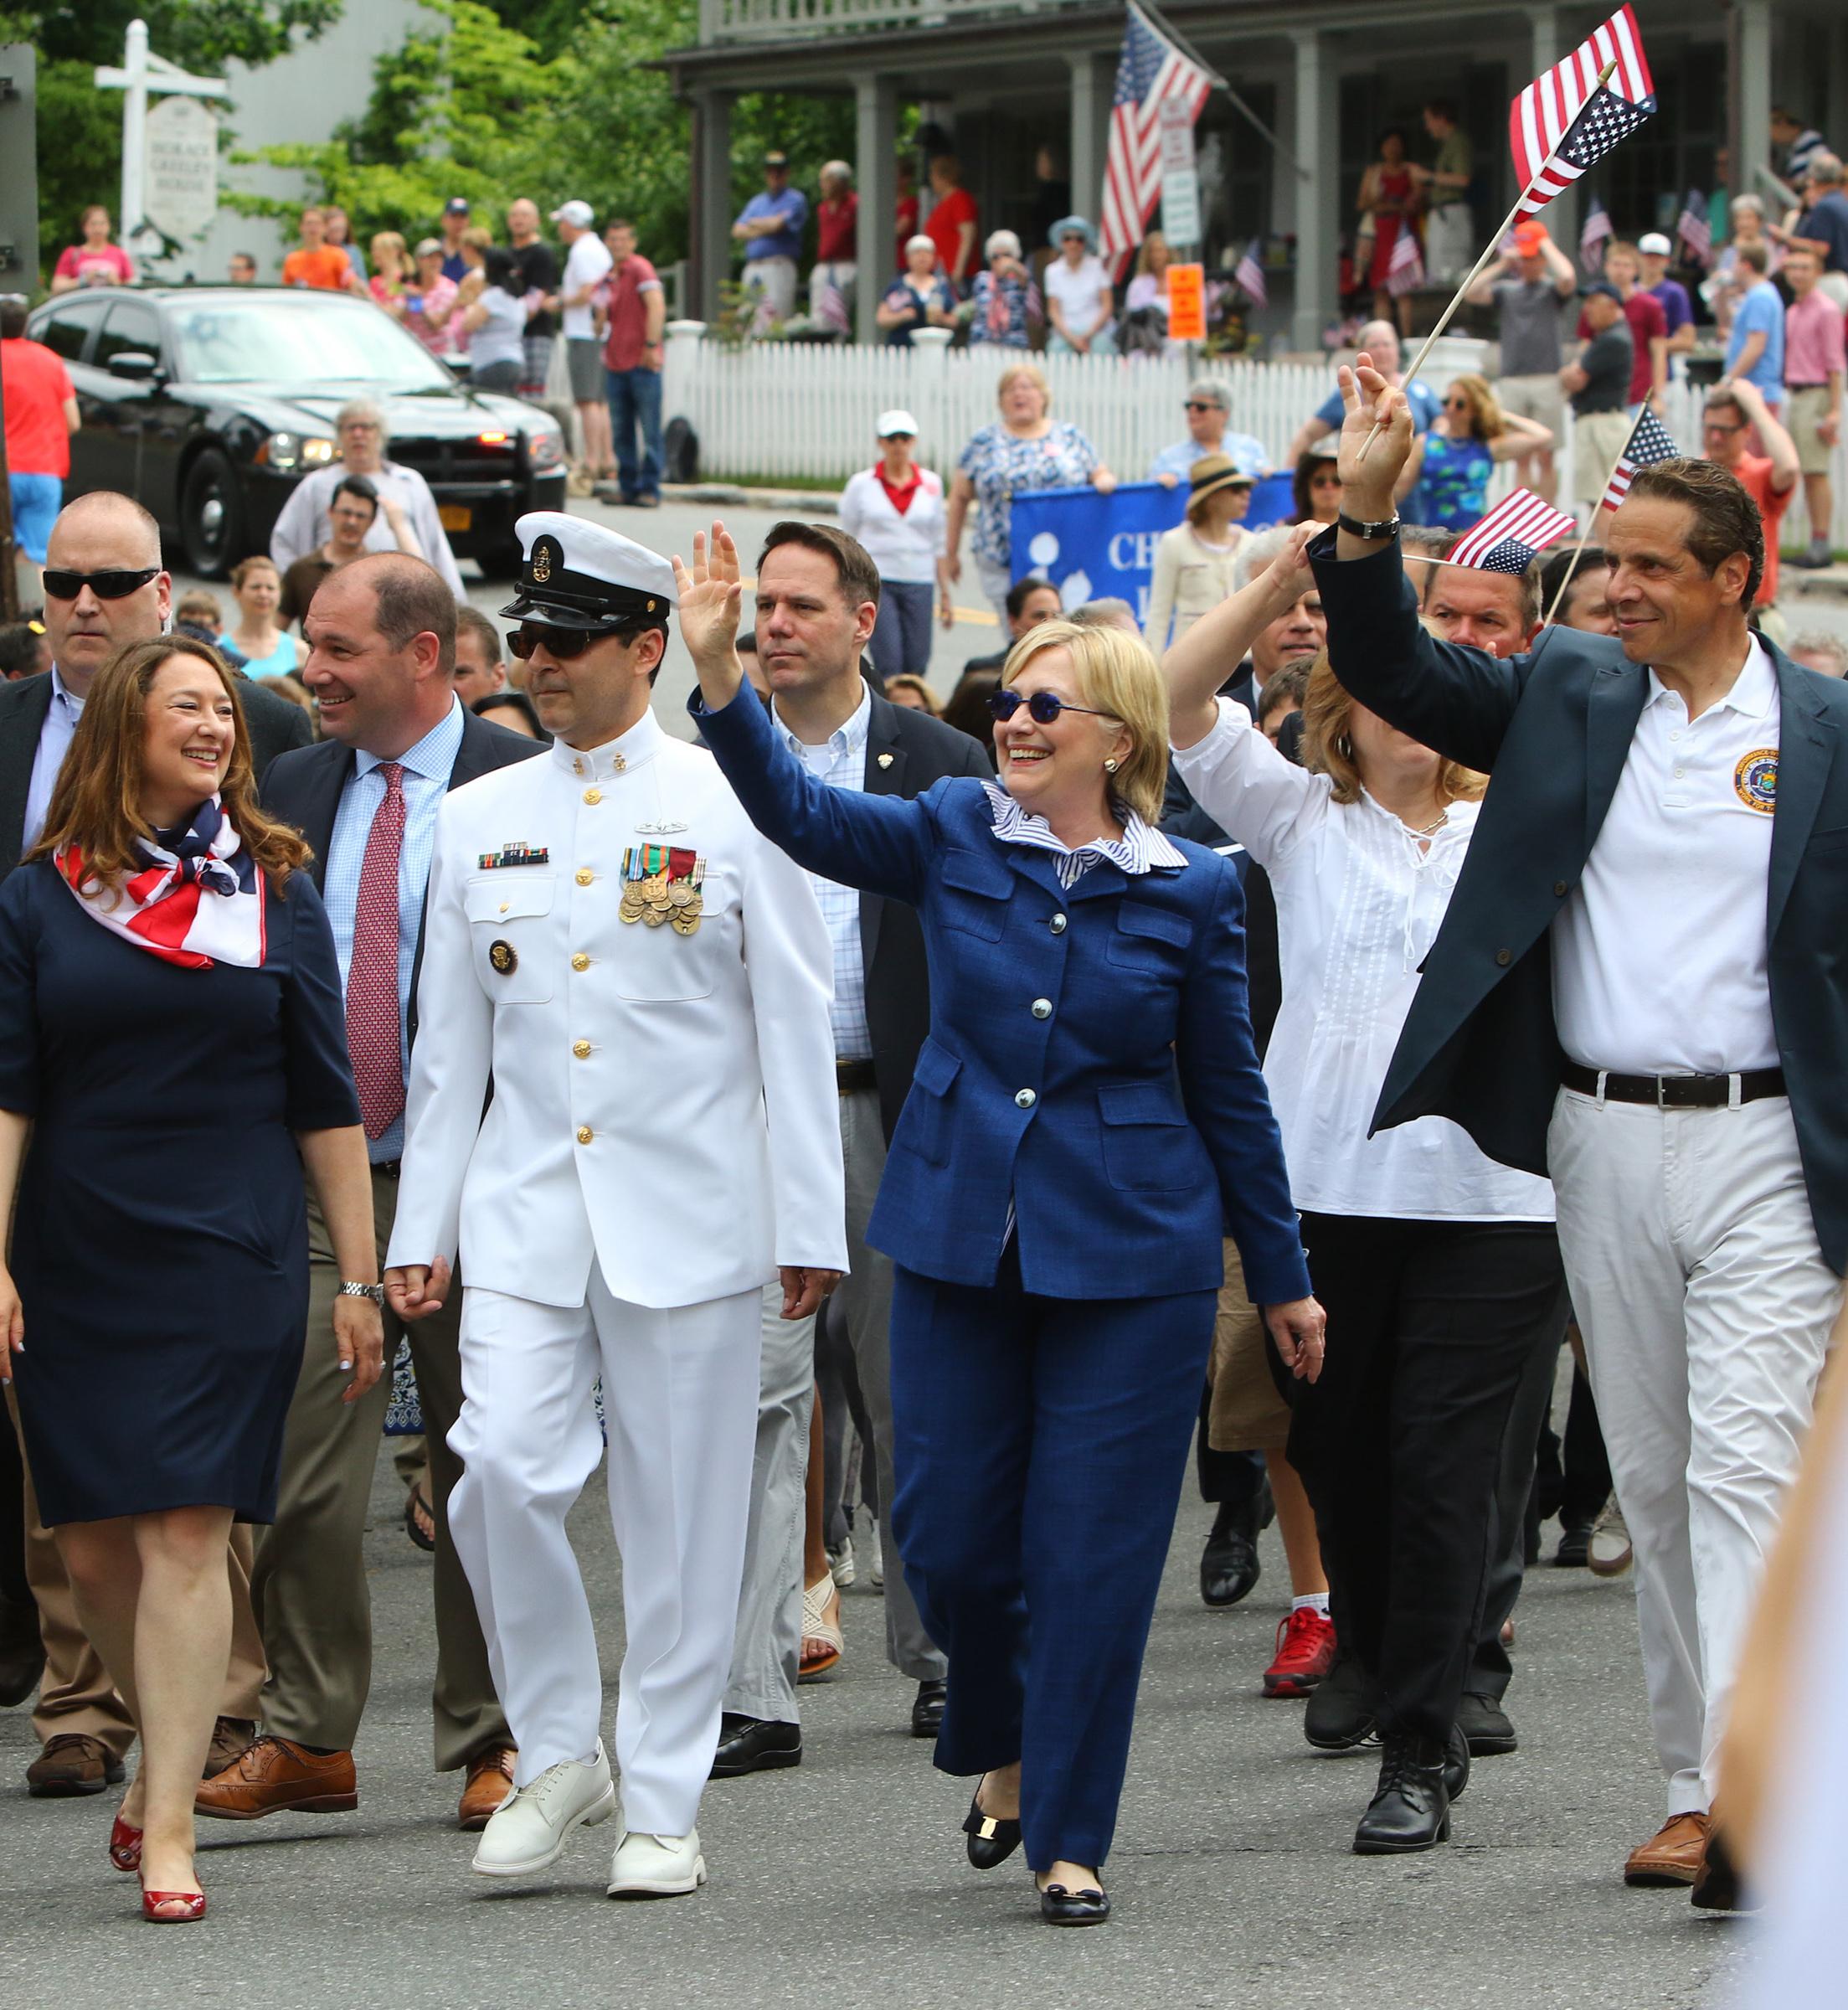 Memorial_parade_Clintons113.jpg